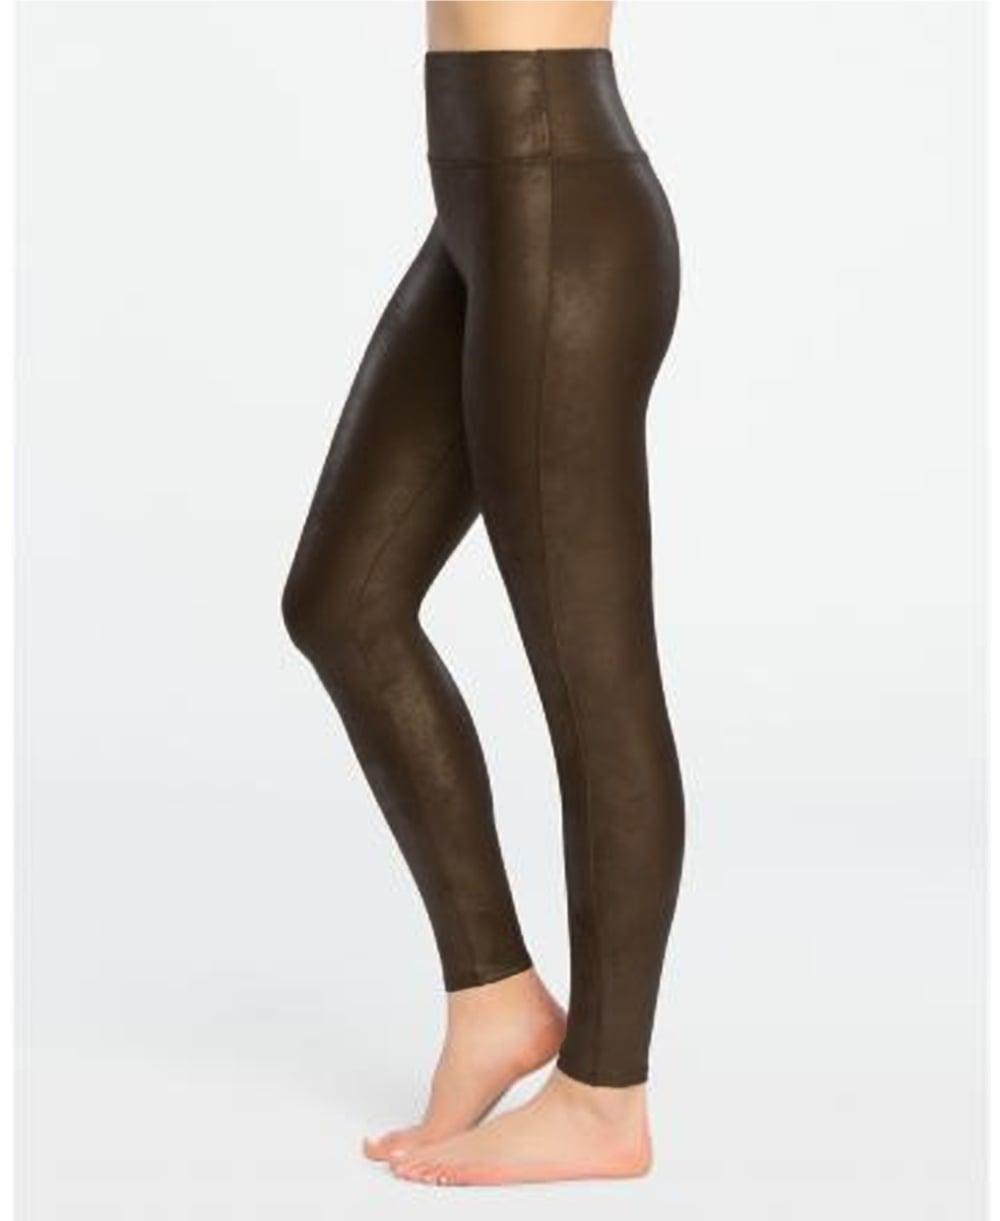 c11b98c478c91b Spanx Faux Leather Leggings - Leggings from luxury-legs.com UK